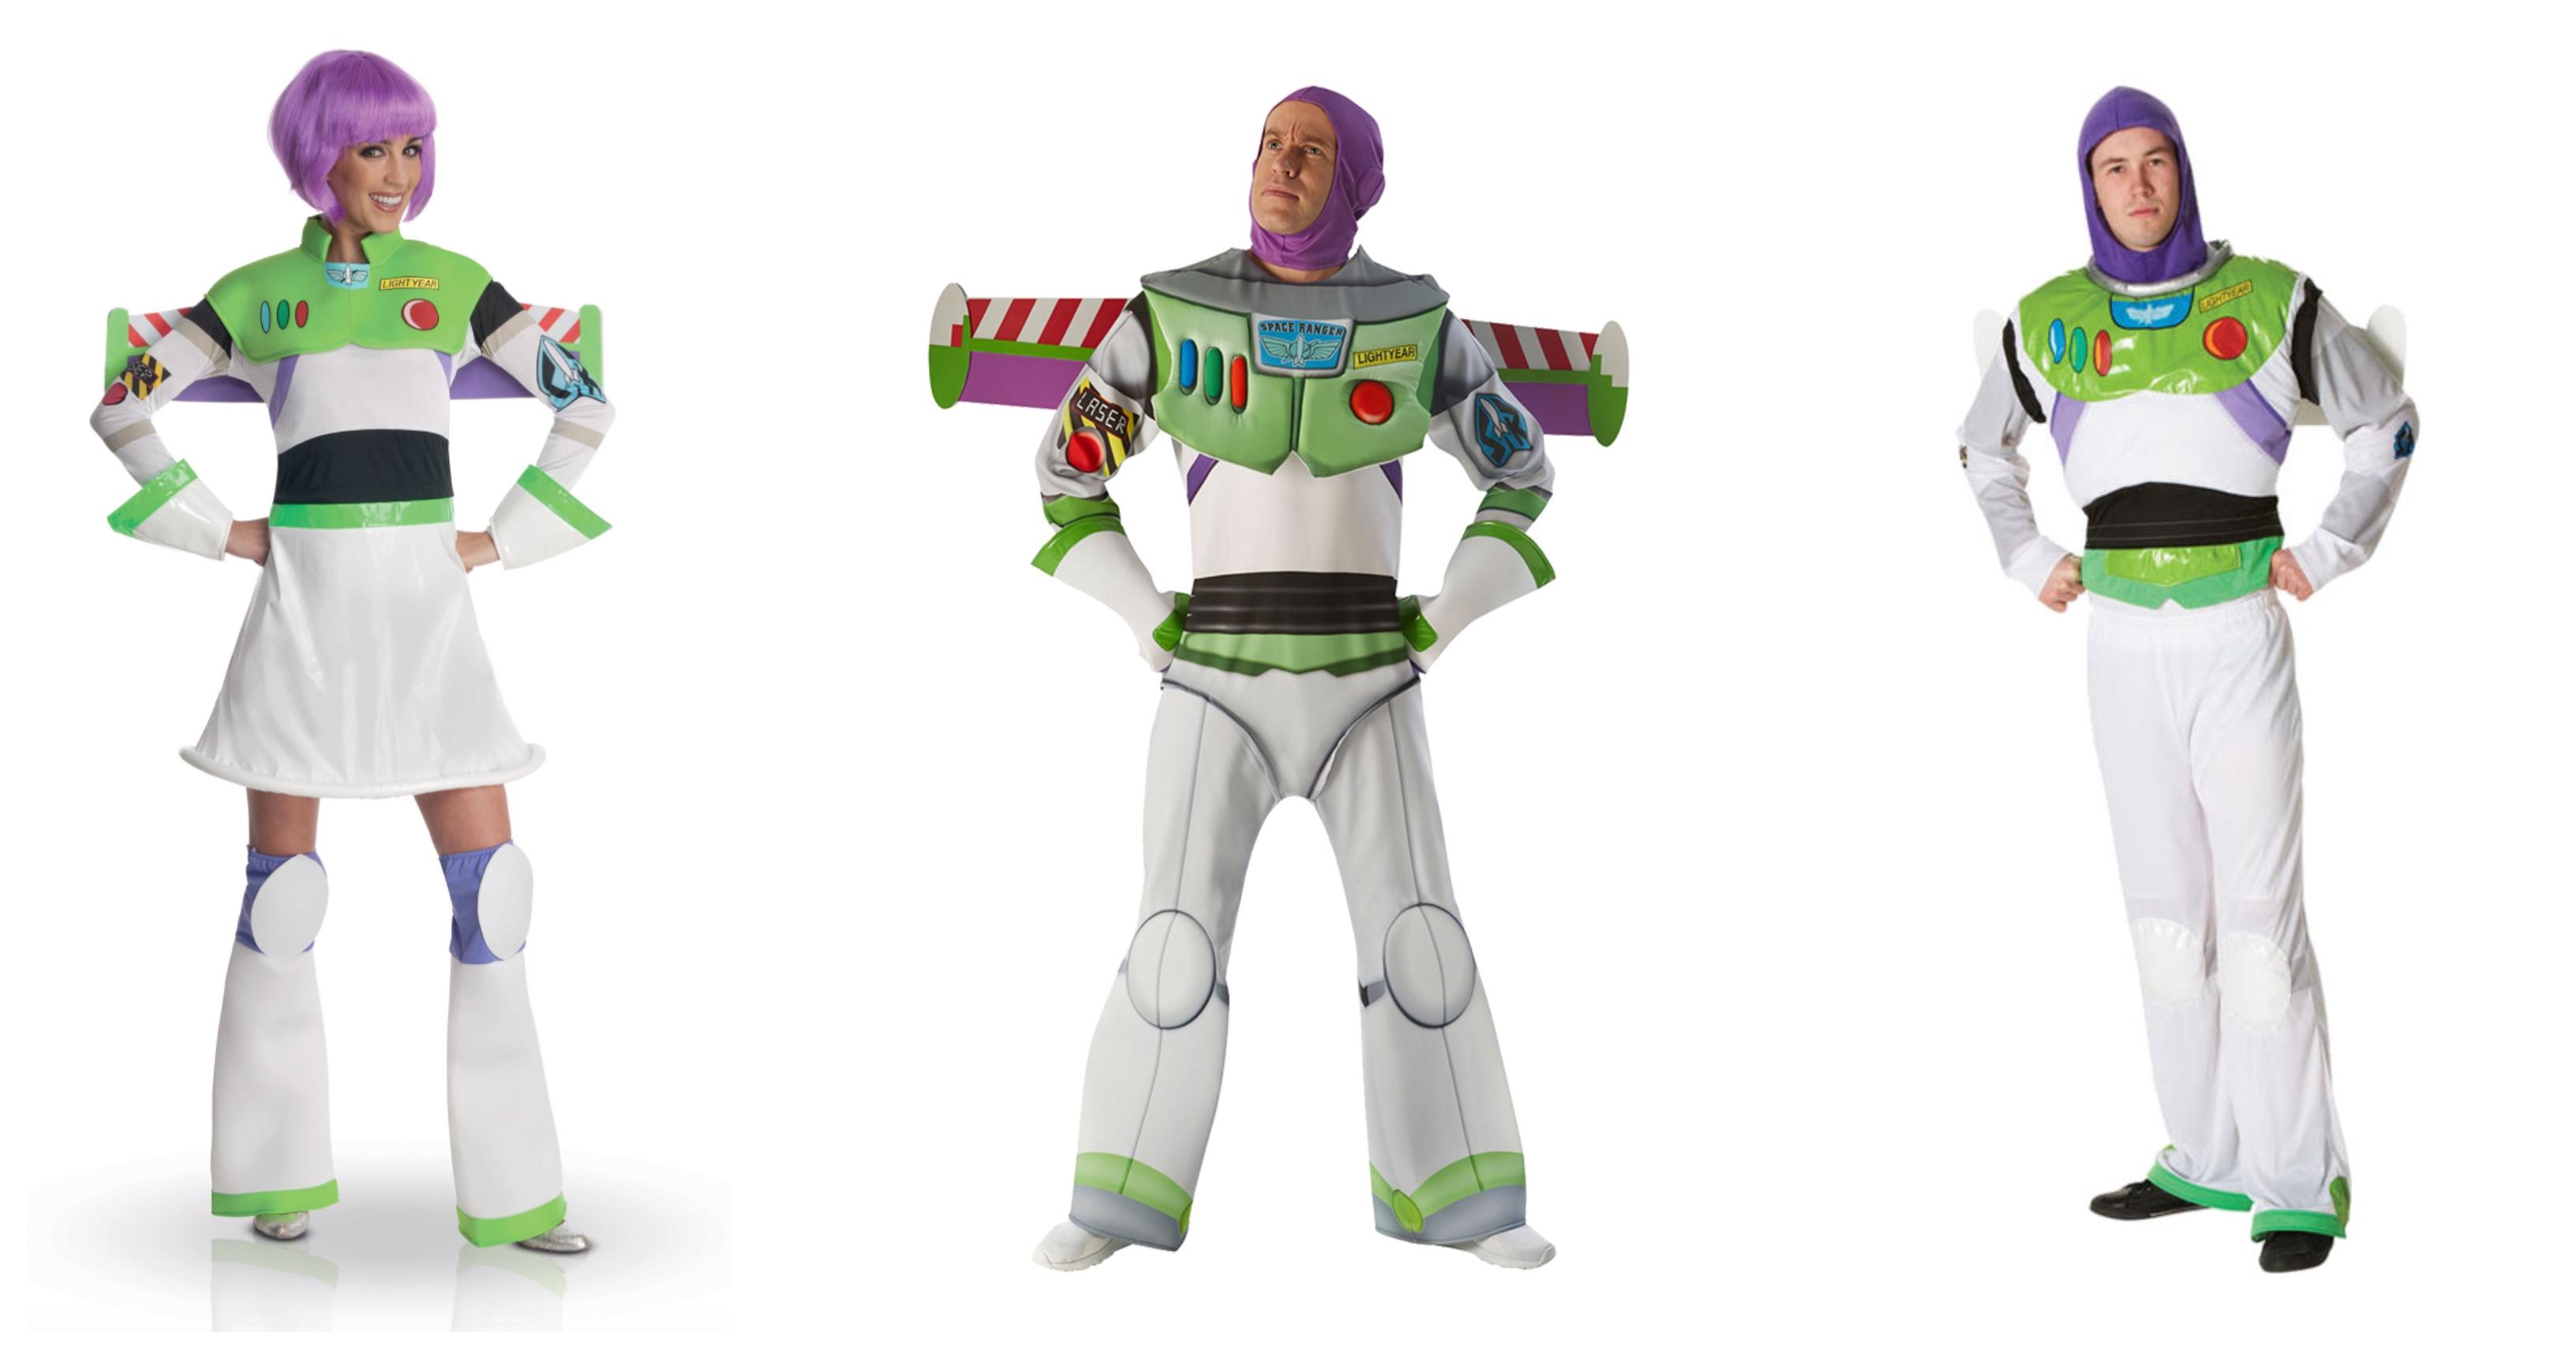 Buzz lightyear kostume til voksne - Toy Story kostume til voksne